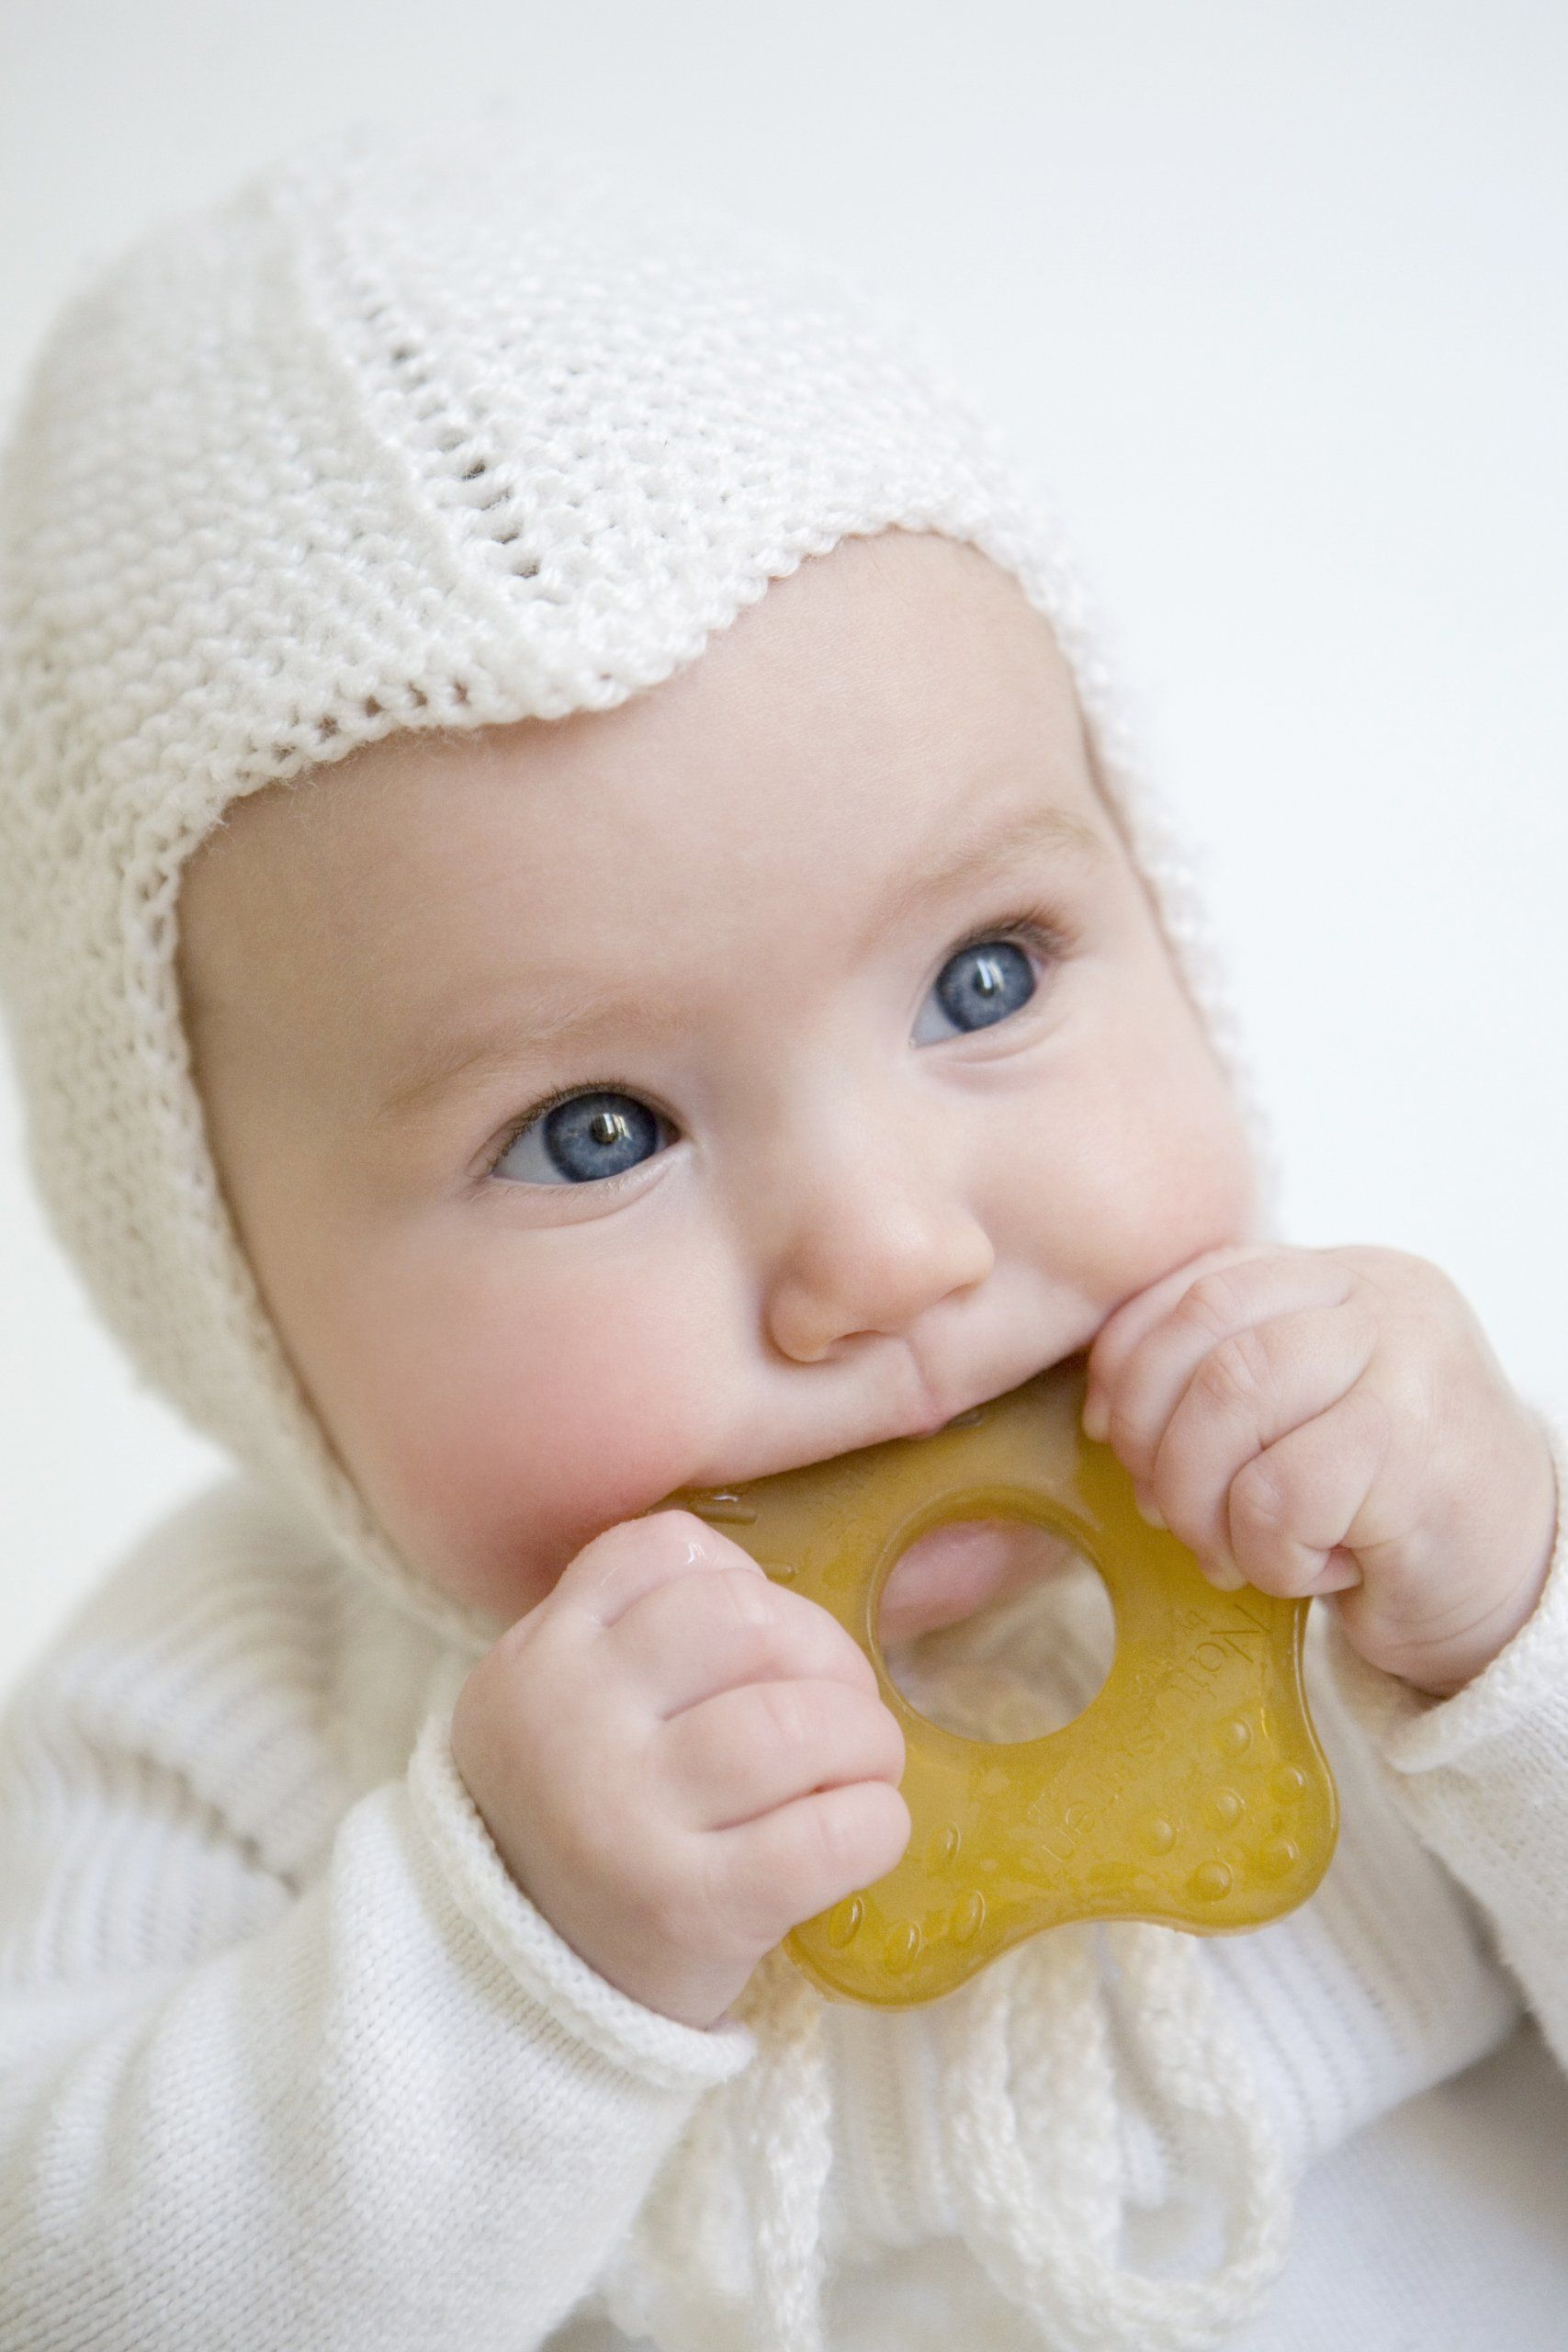 PINK BABY TEETHING TEETHER RING-BPA SAFE Refrigerate to cool FRUIT RING